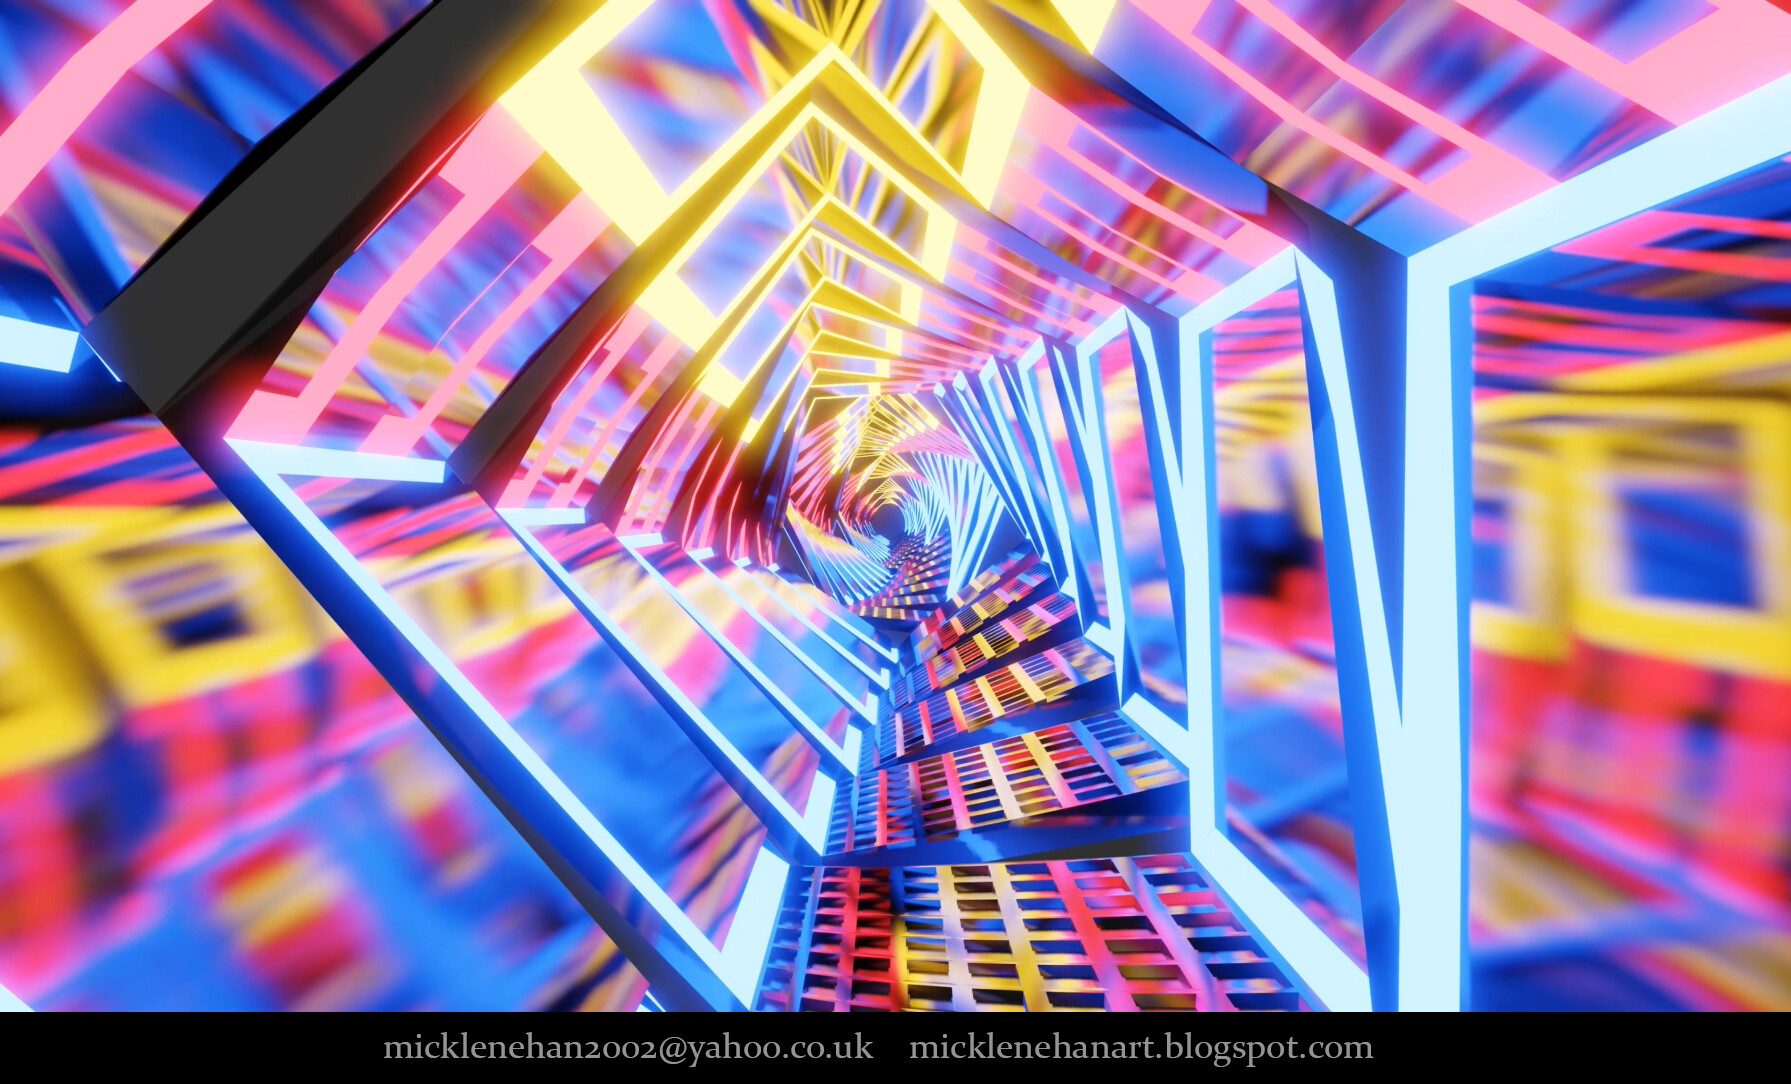 ArtStation - Blender 2 8 EEVEE Techno Tunnel v2 Animation 4K